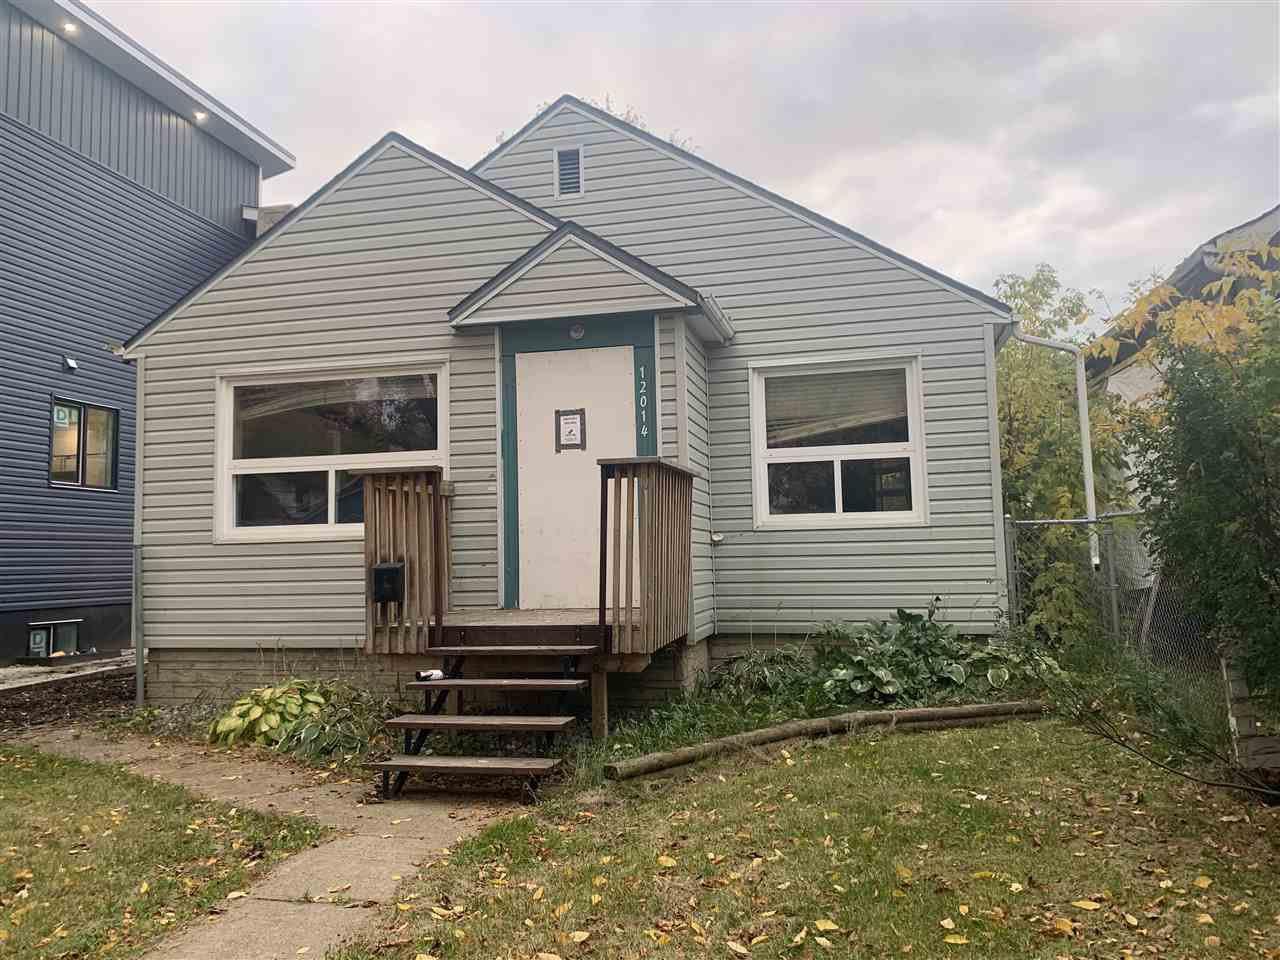 Main Photo: 12014 92 Street in Edmonton: Zone 05 House for sale : MLS®# E4175358